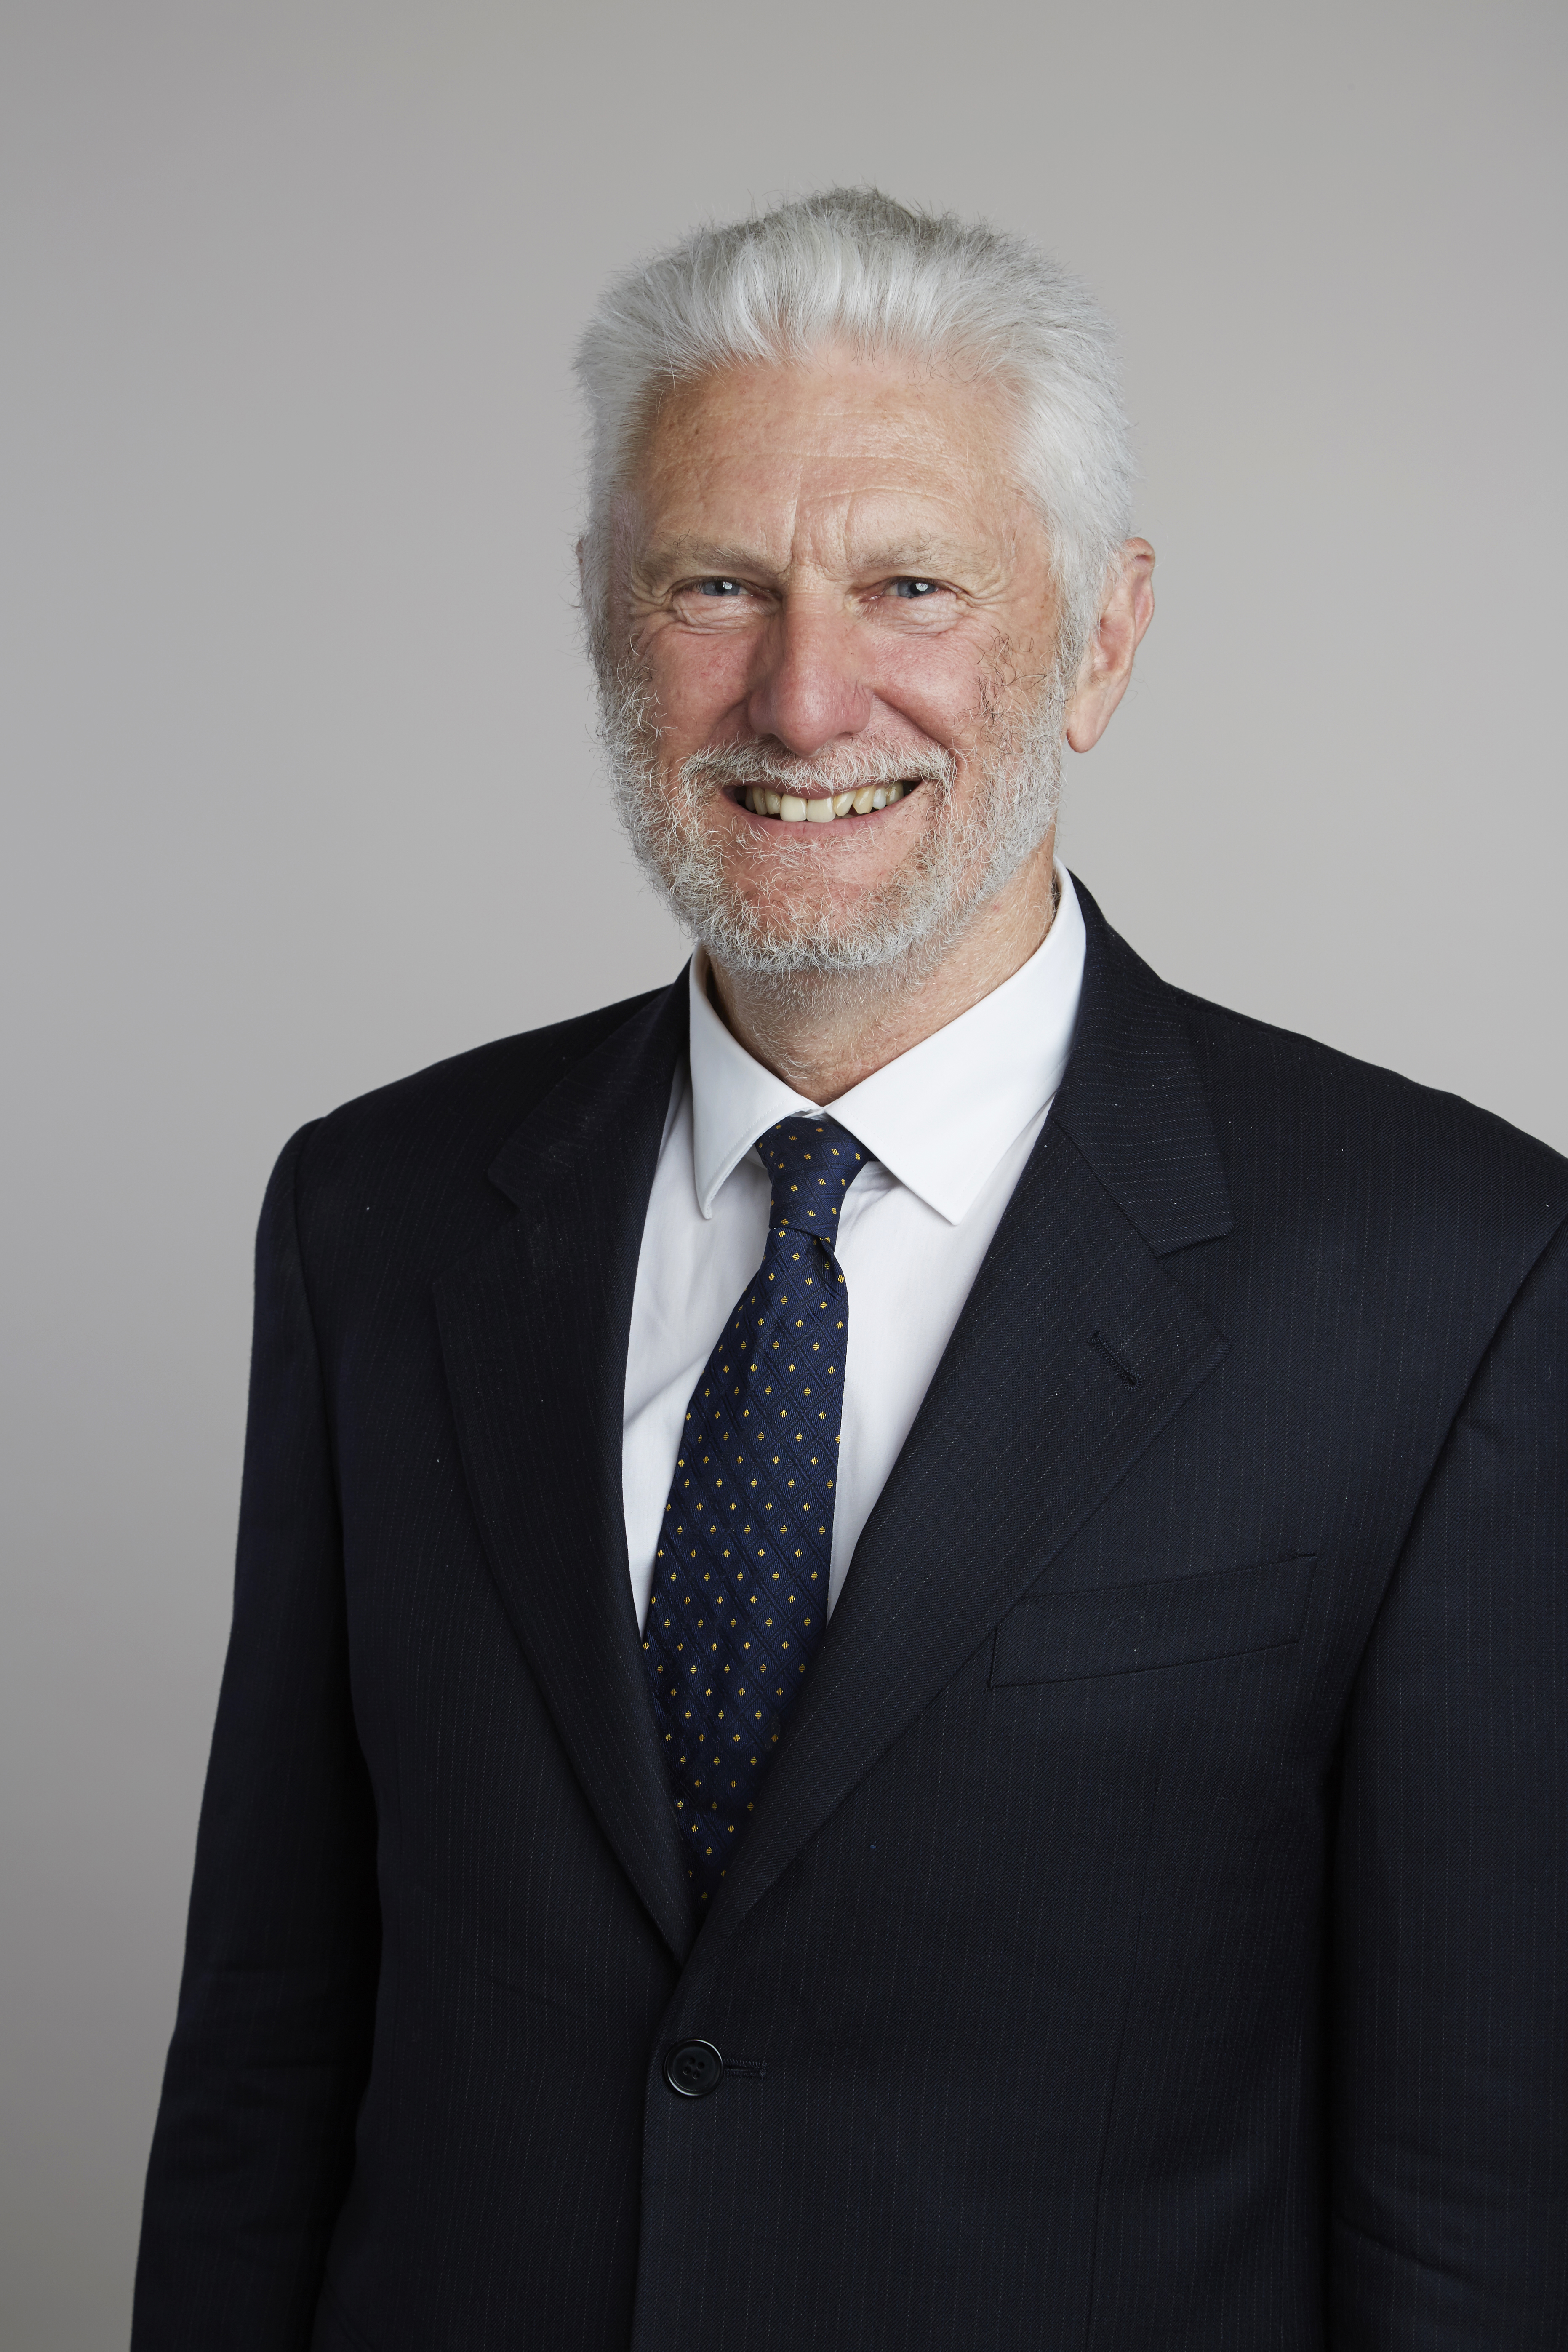 image of Michael E. Goddard